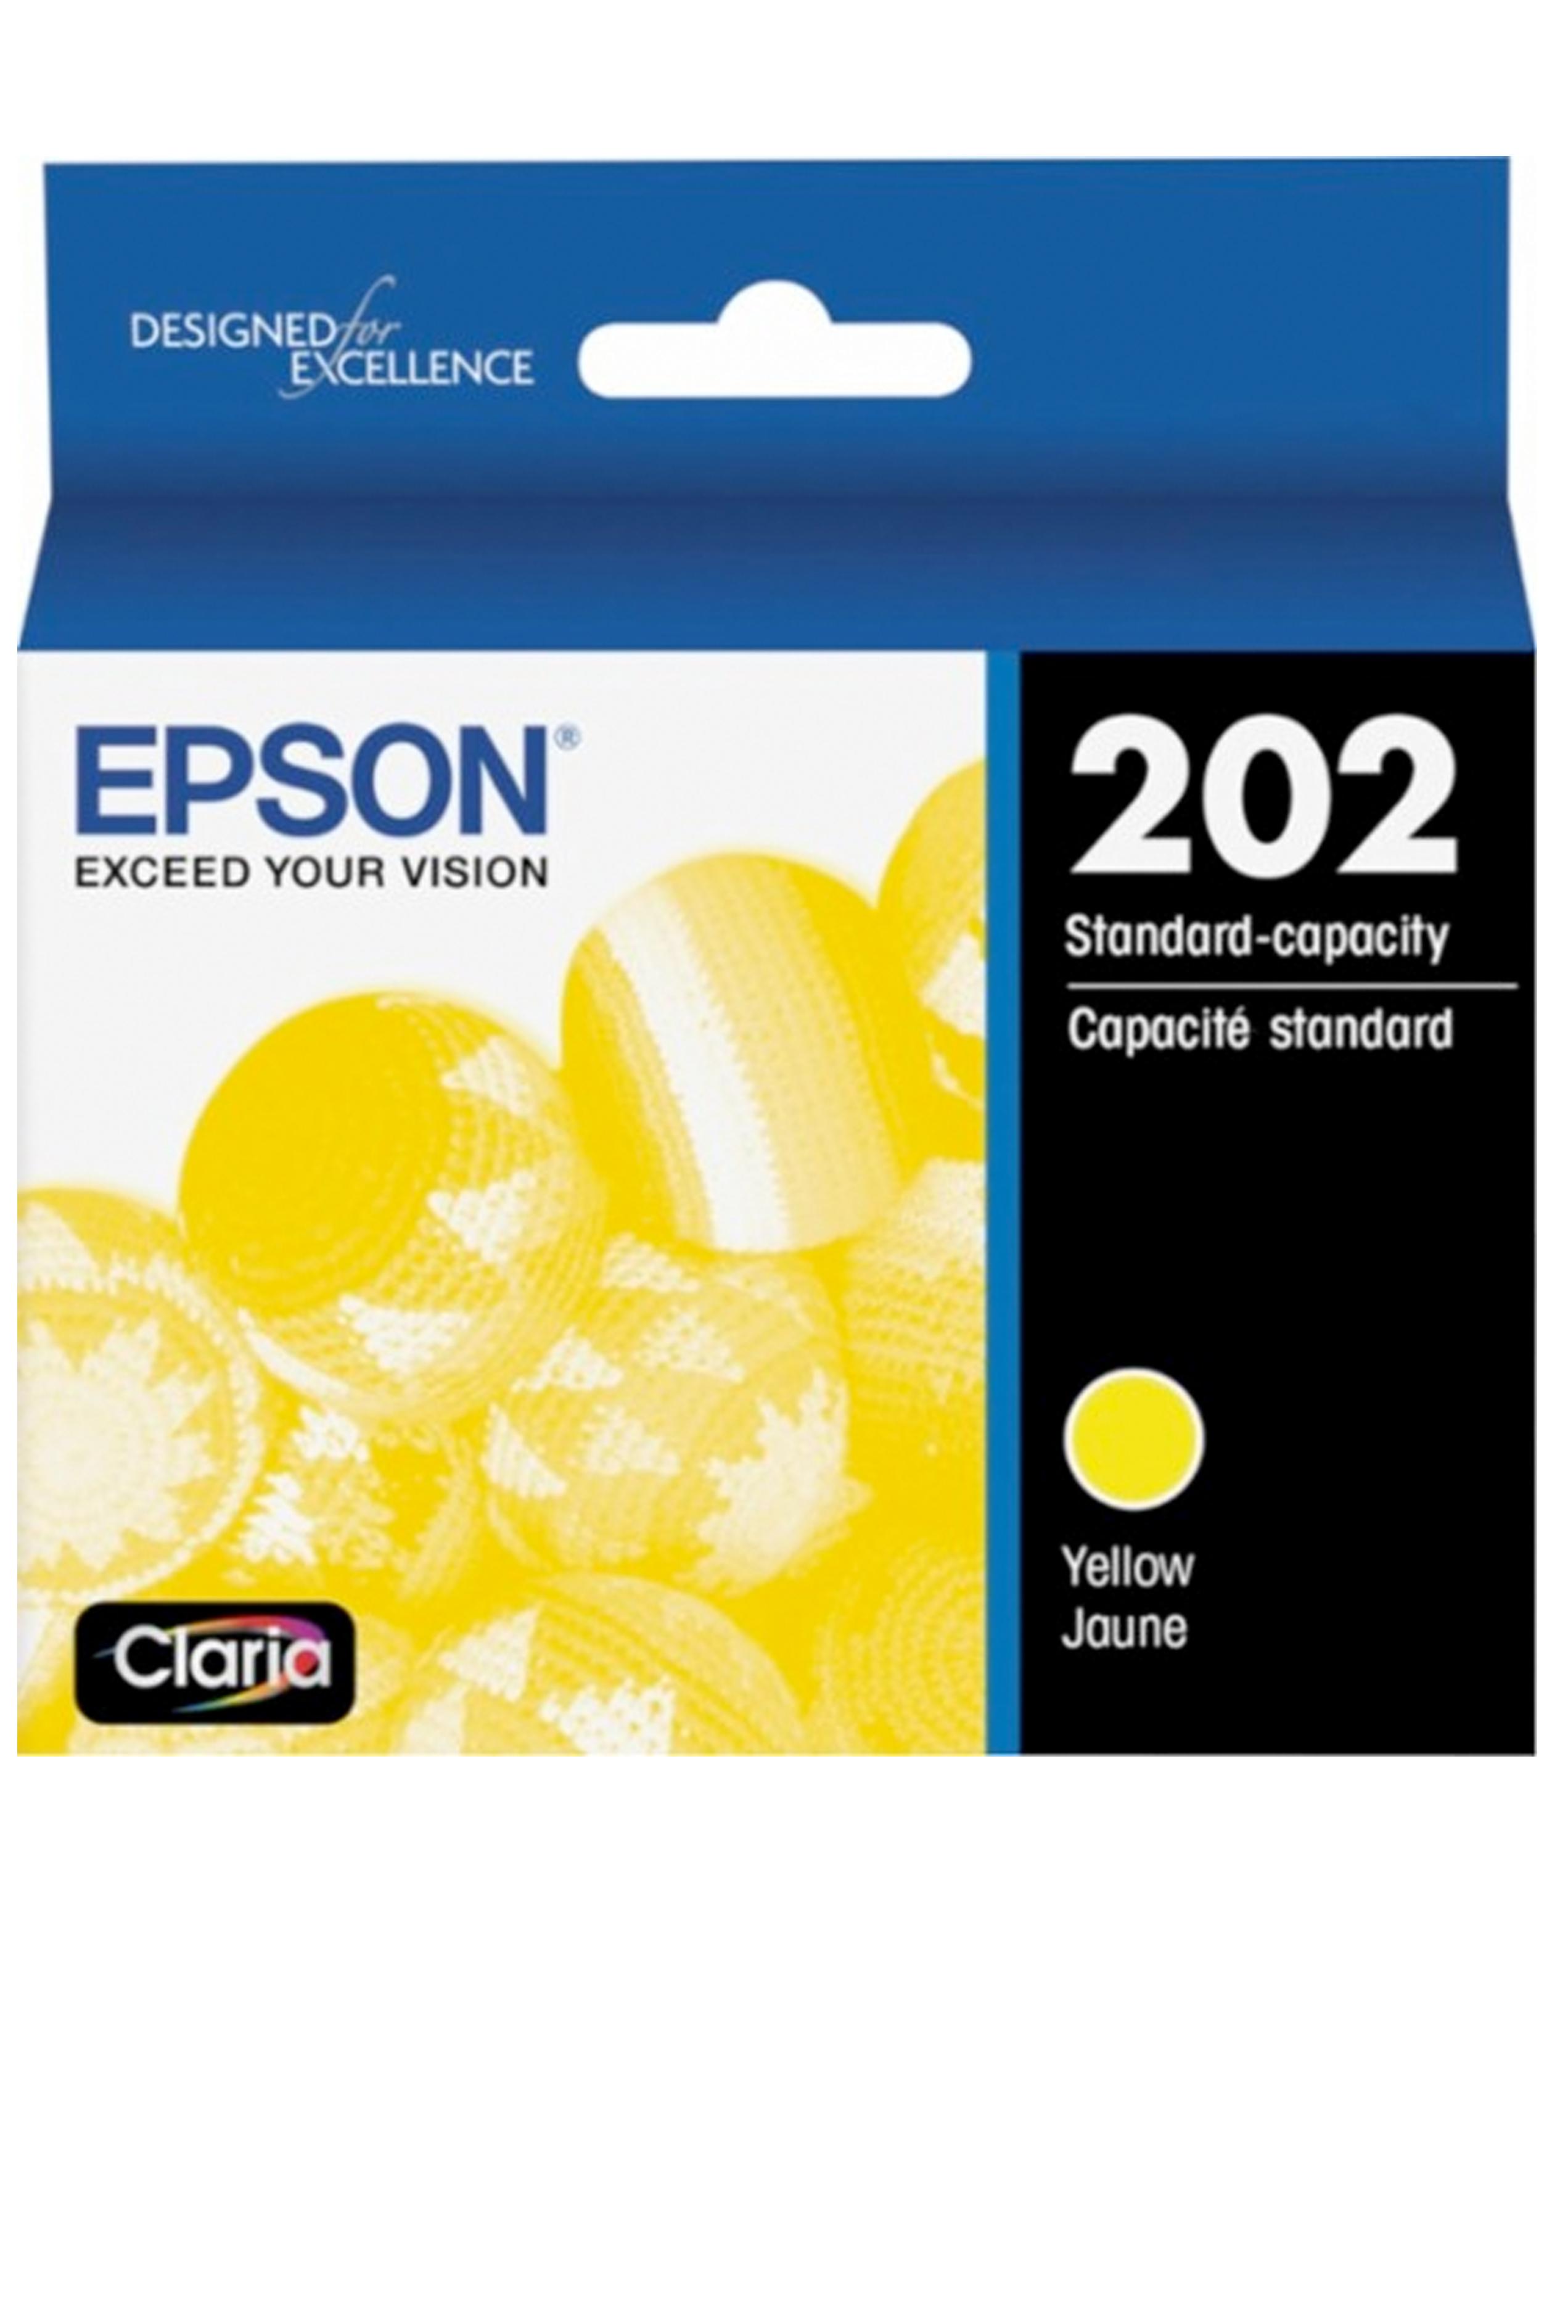 Epson 202, Yellow Ink Cartridge (T202420-S)